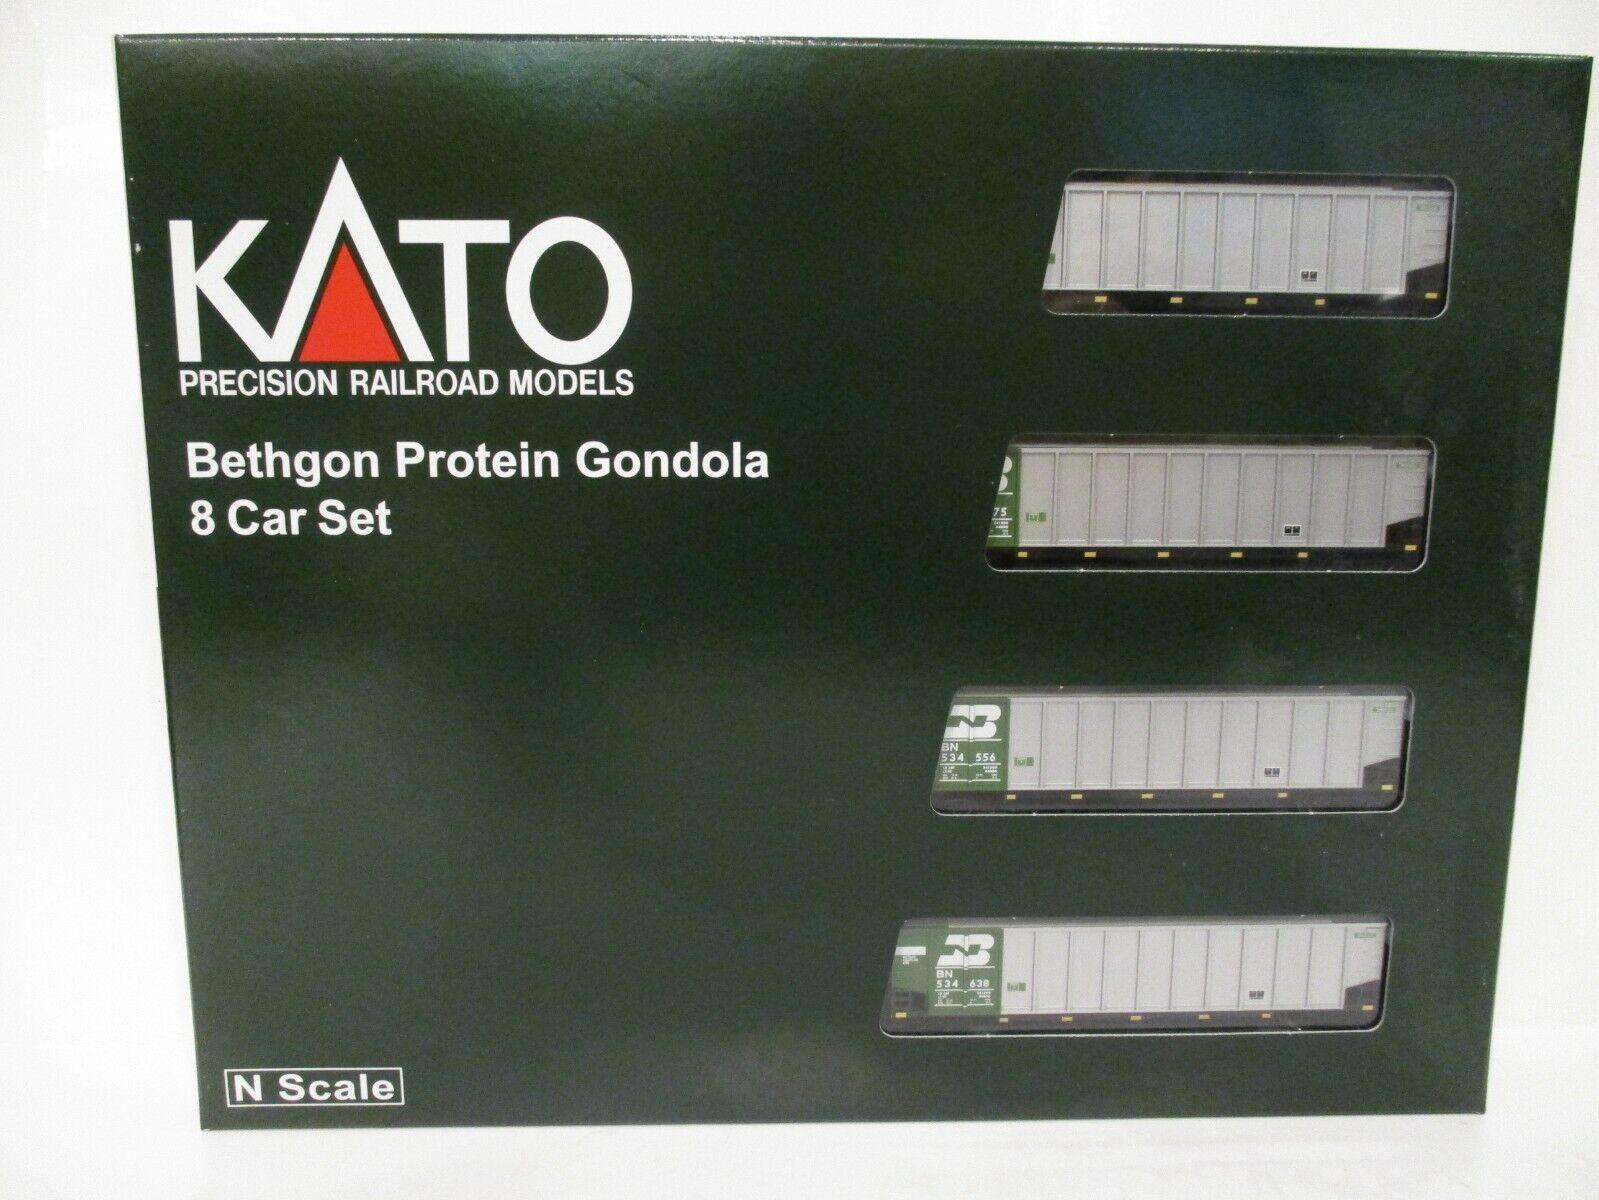 Kato scala N bethgon prossoeine GONDOLA 8 Auto SetBurlington NorthernBN 1